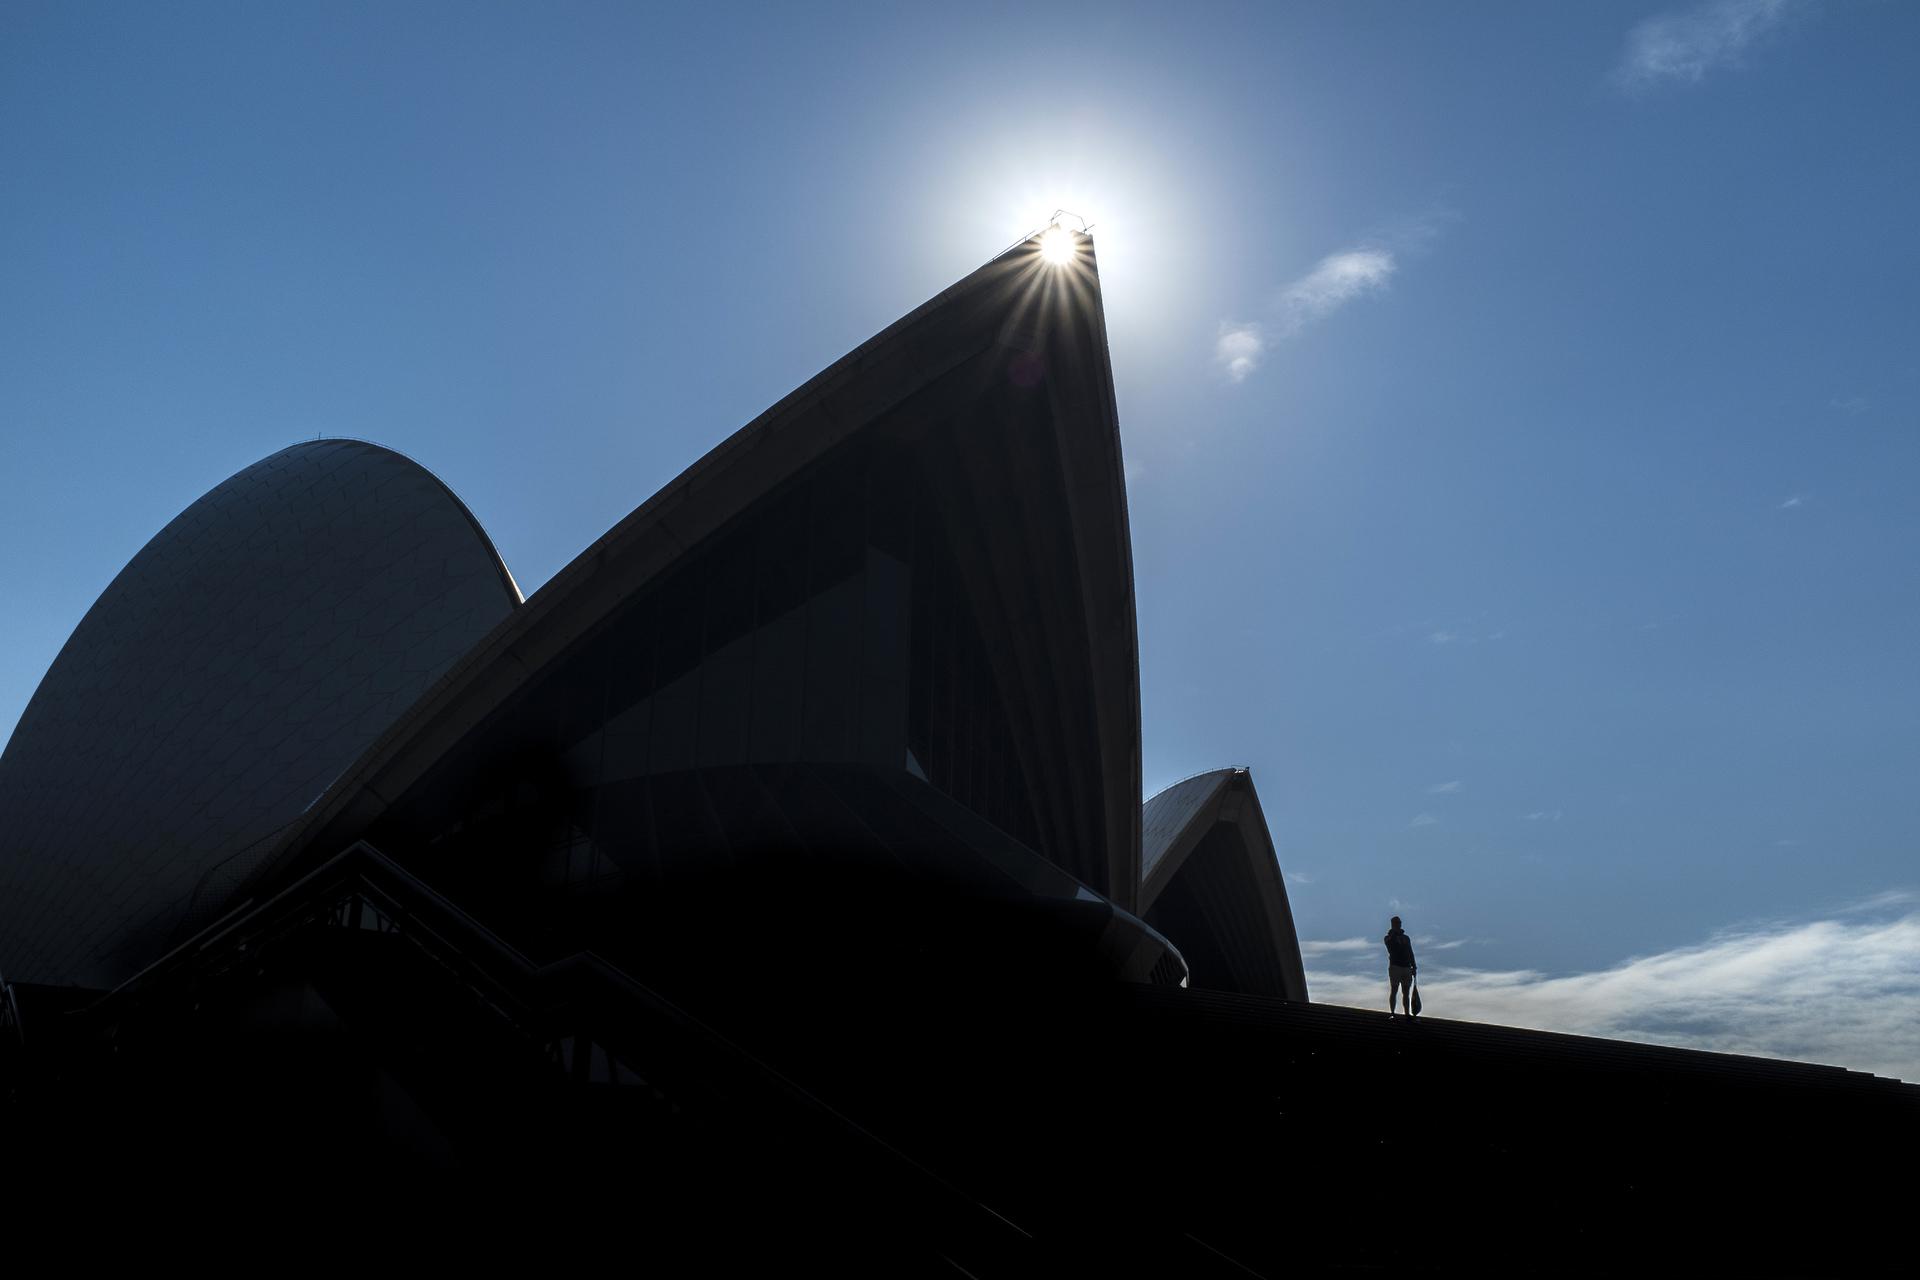 Sydney travel photographer, country, adventure, photo tour, travel photography, destinations, award winning, tips, lessons, Sydney Opera house